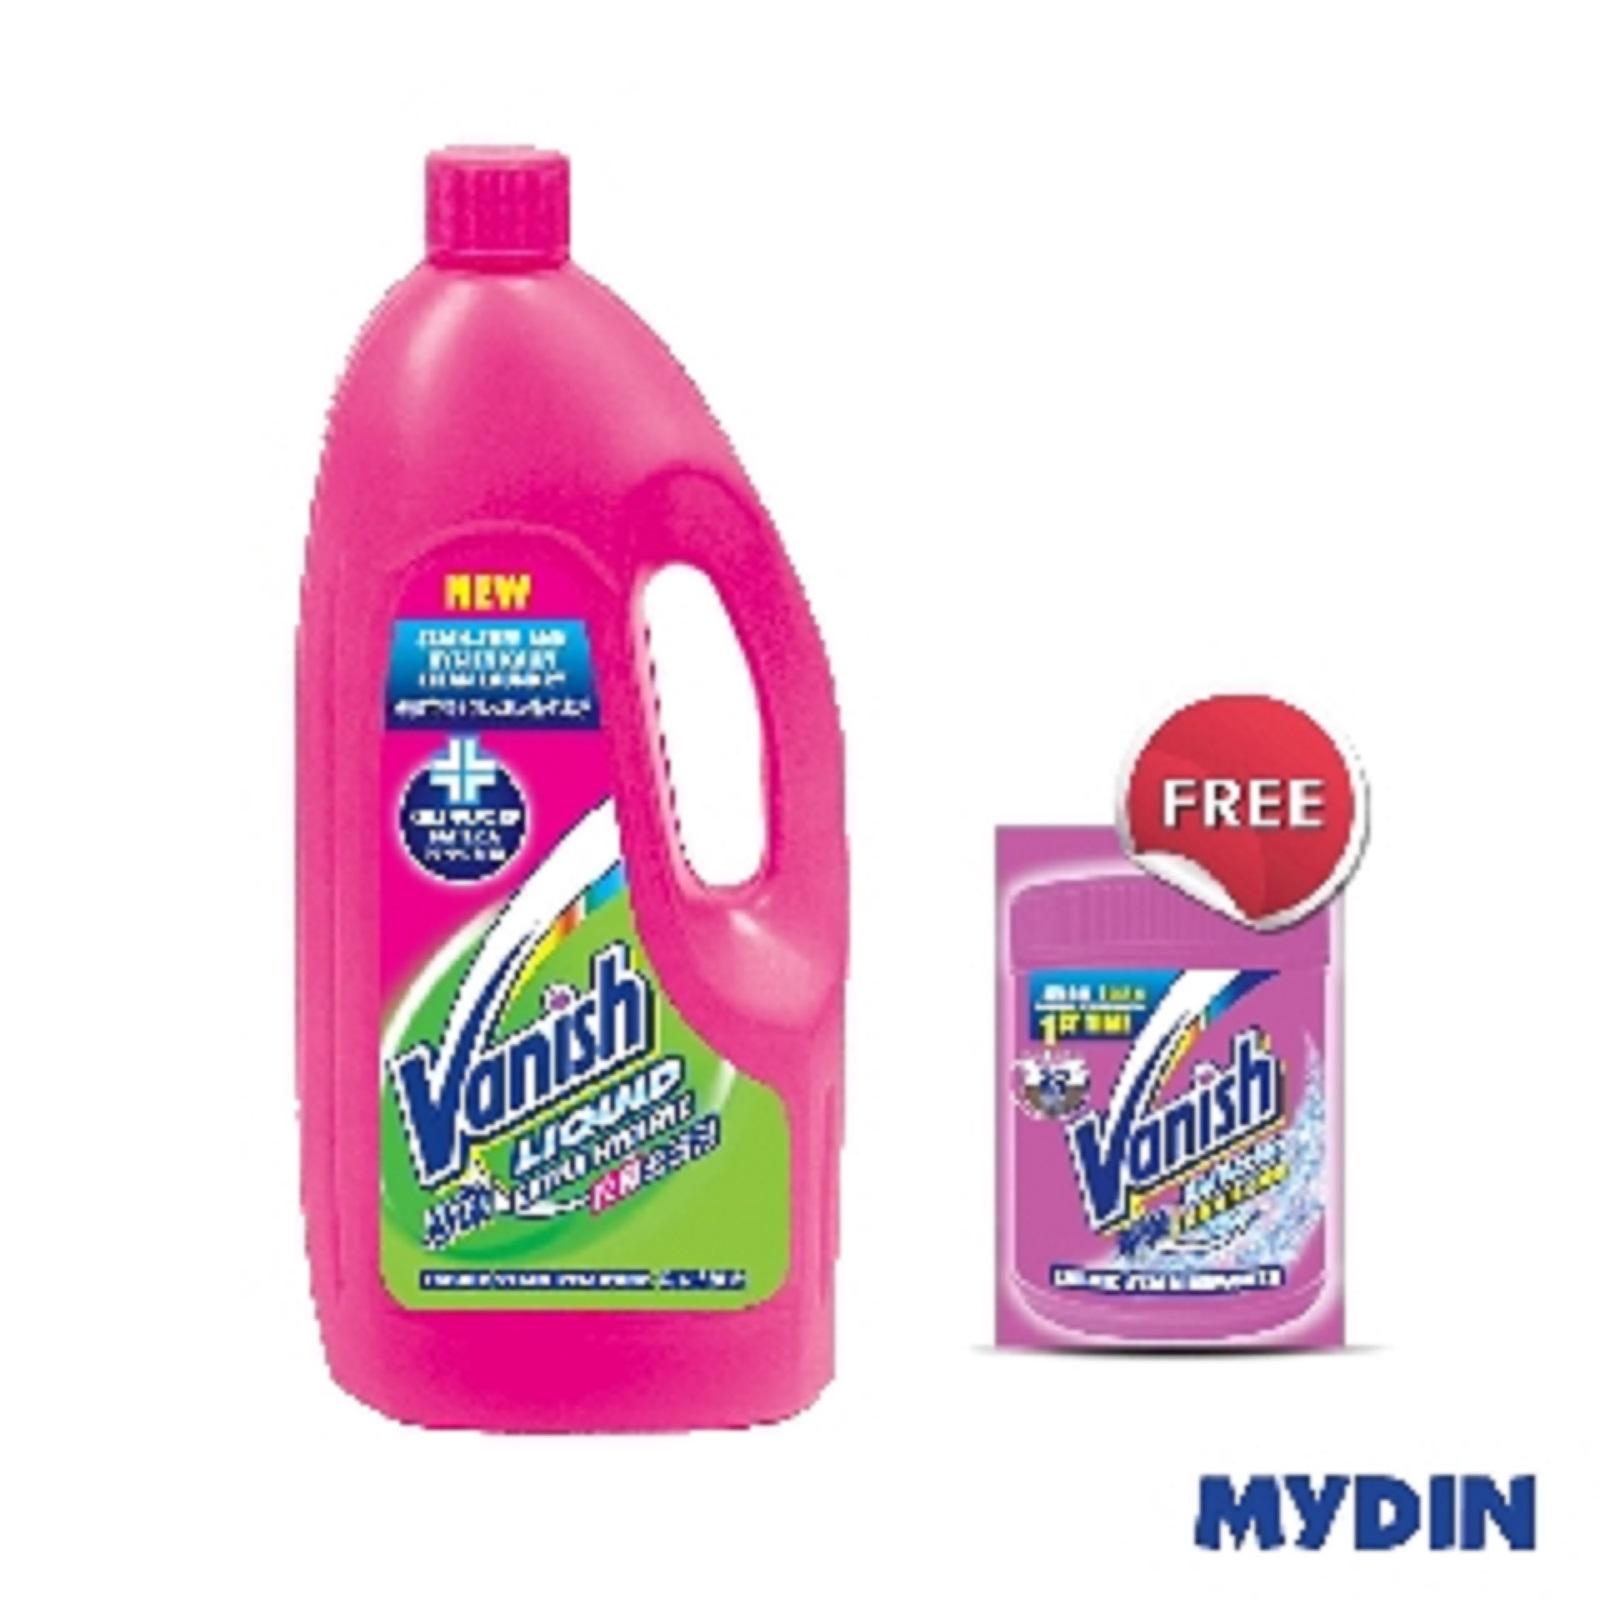 Vanish Extra Hygiene Fabric Stain Remover Liquid 1L (FOC Vanish Powder 30g Sachet - while stocks last)